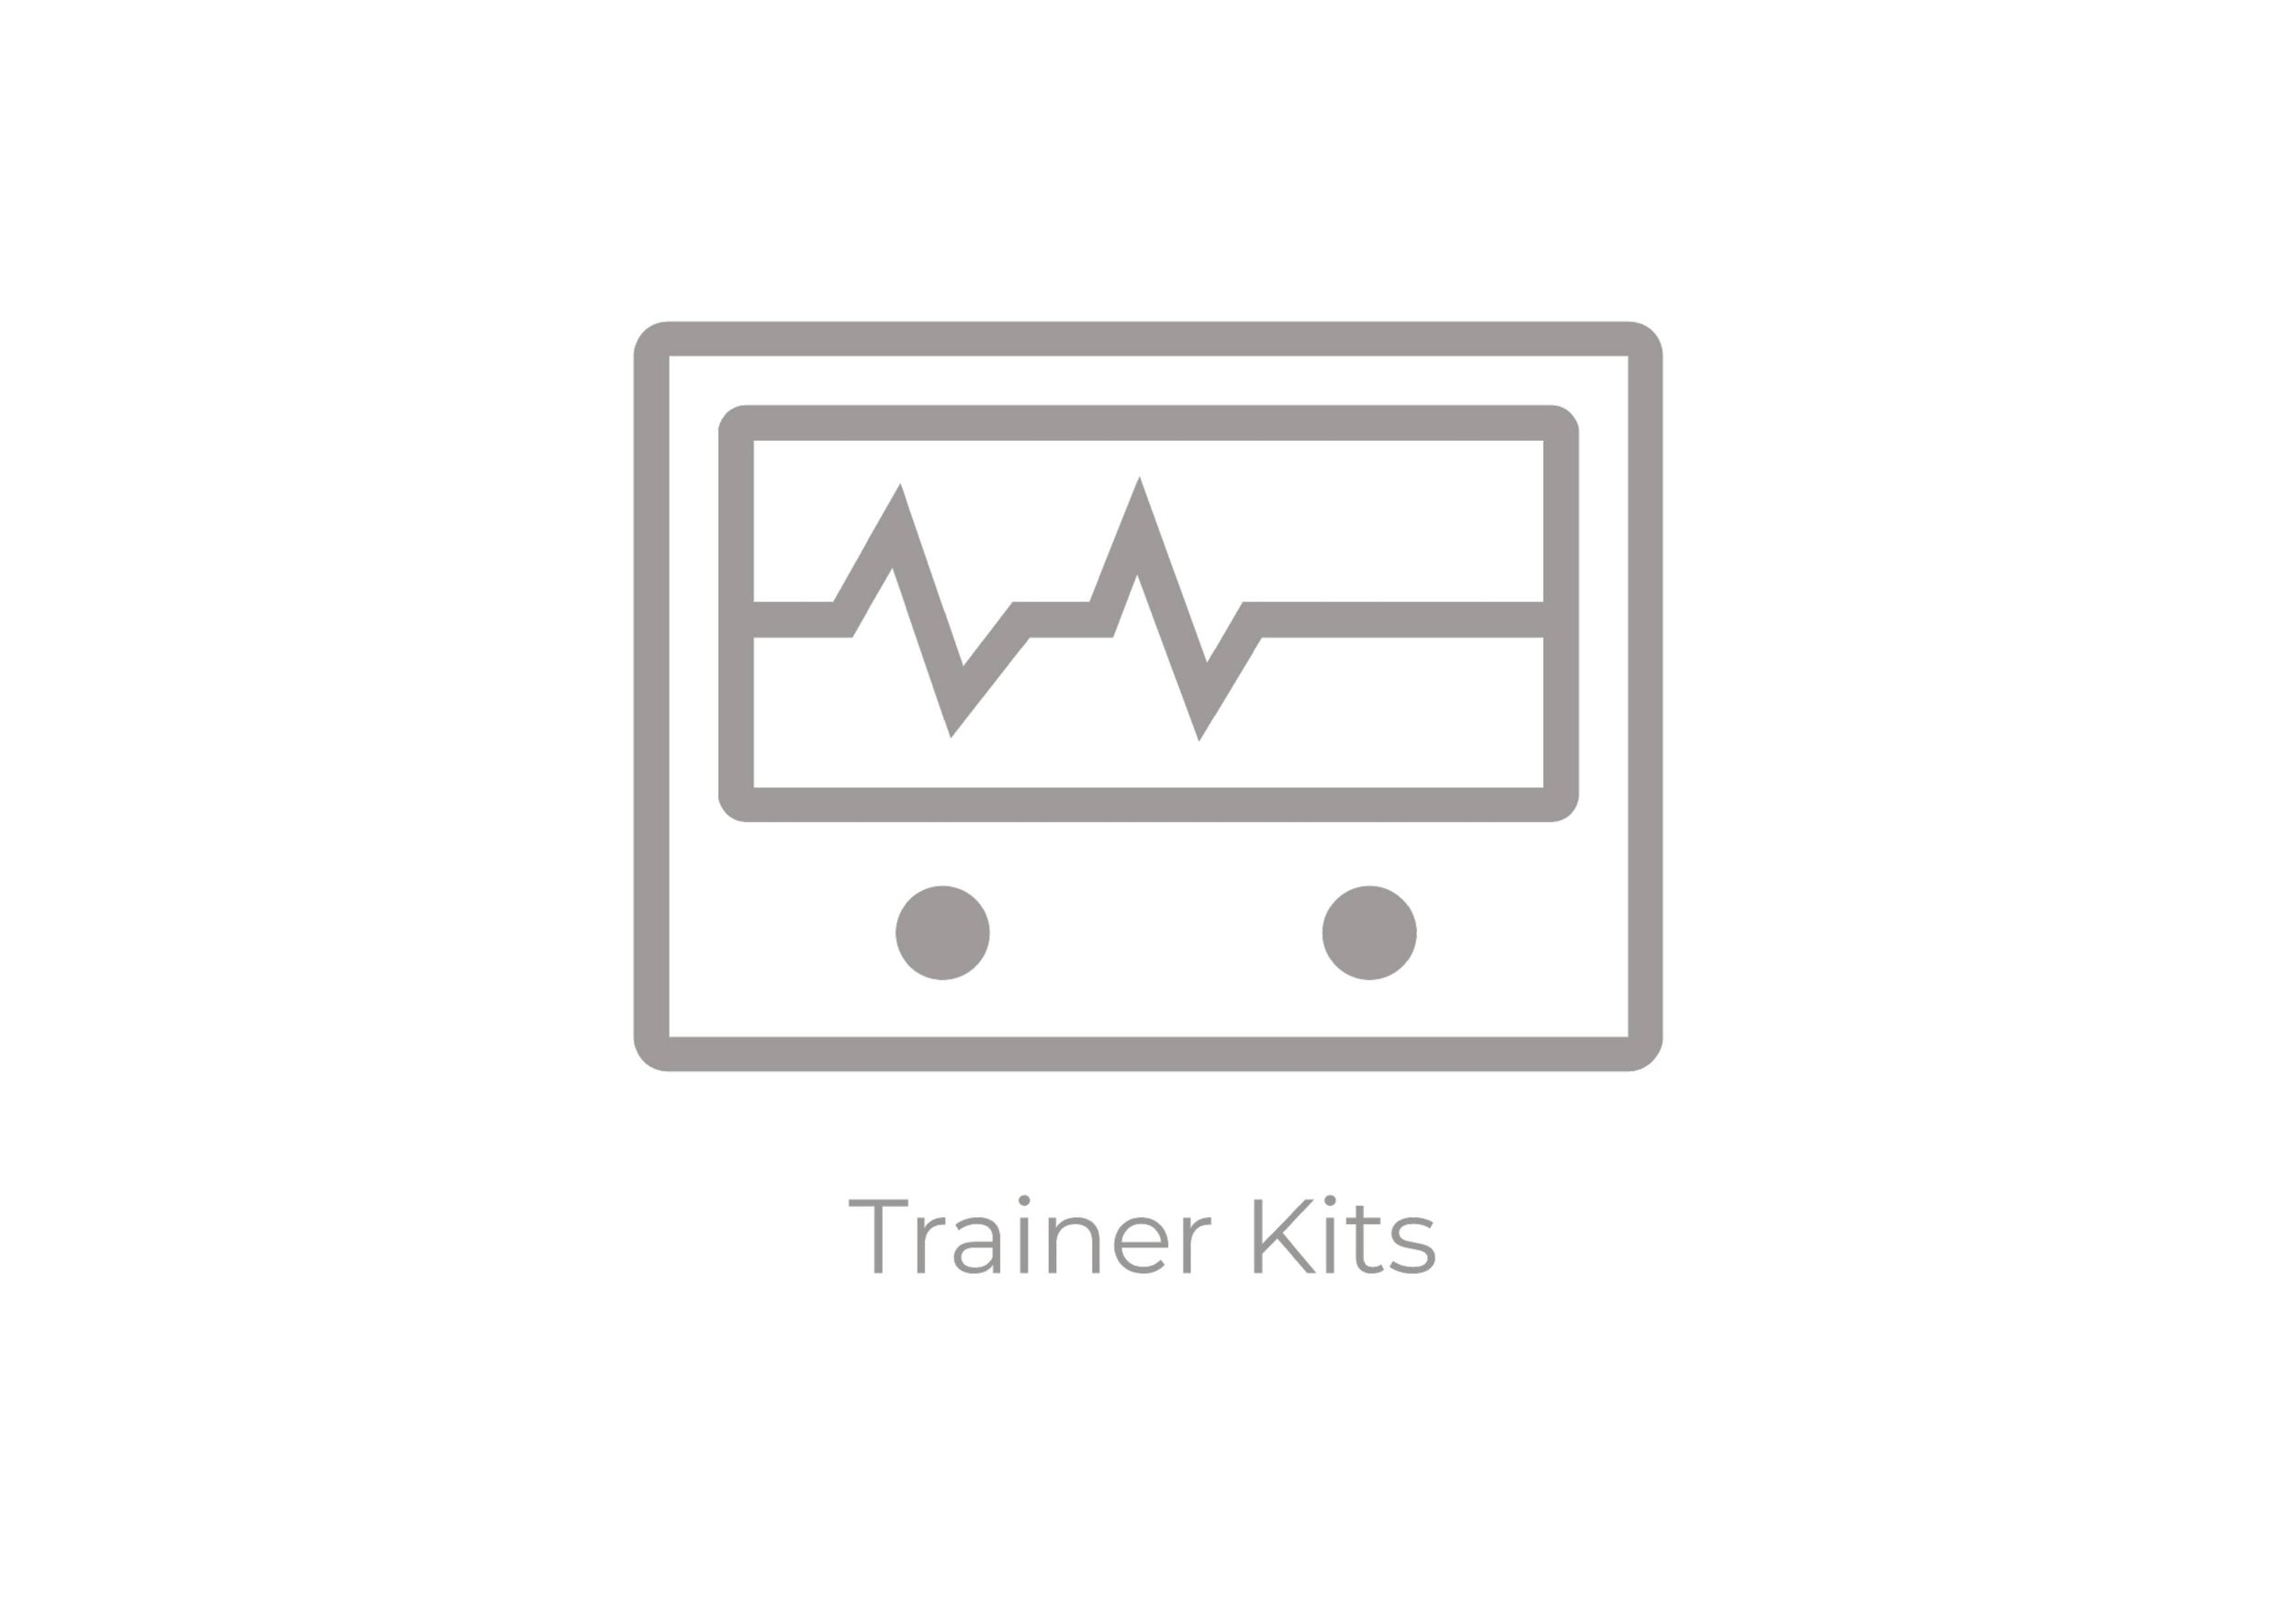 trainerkits.jpg